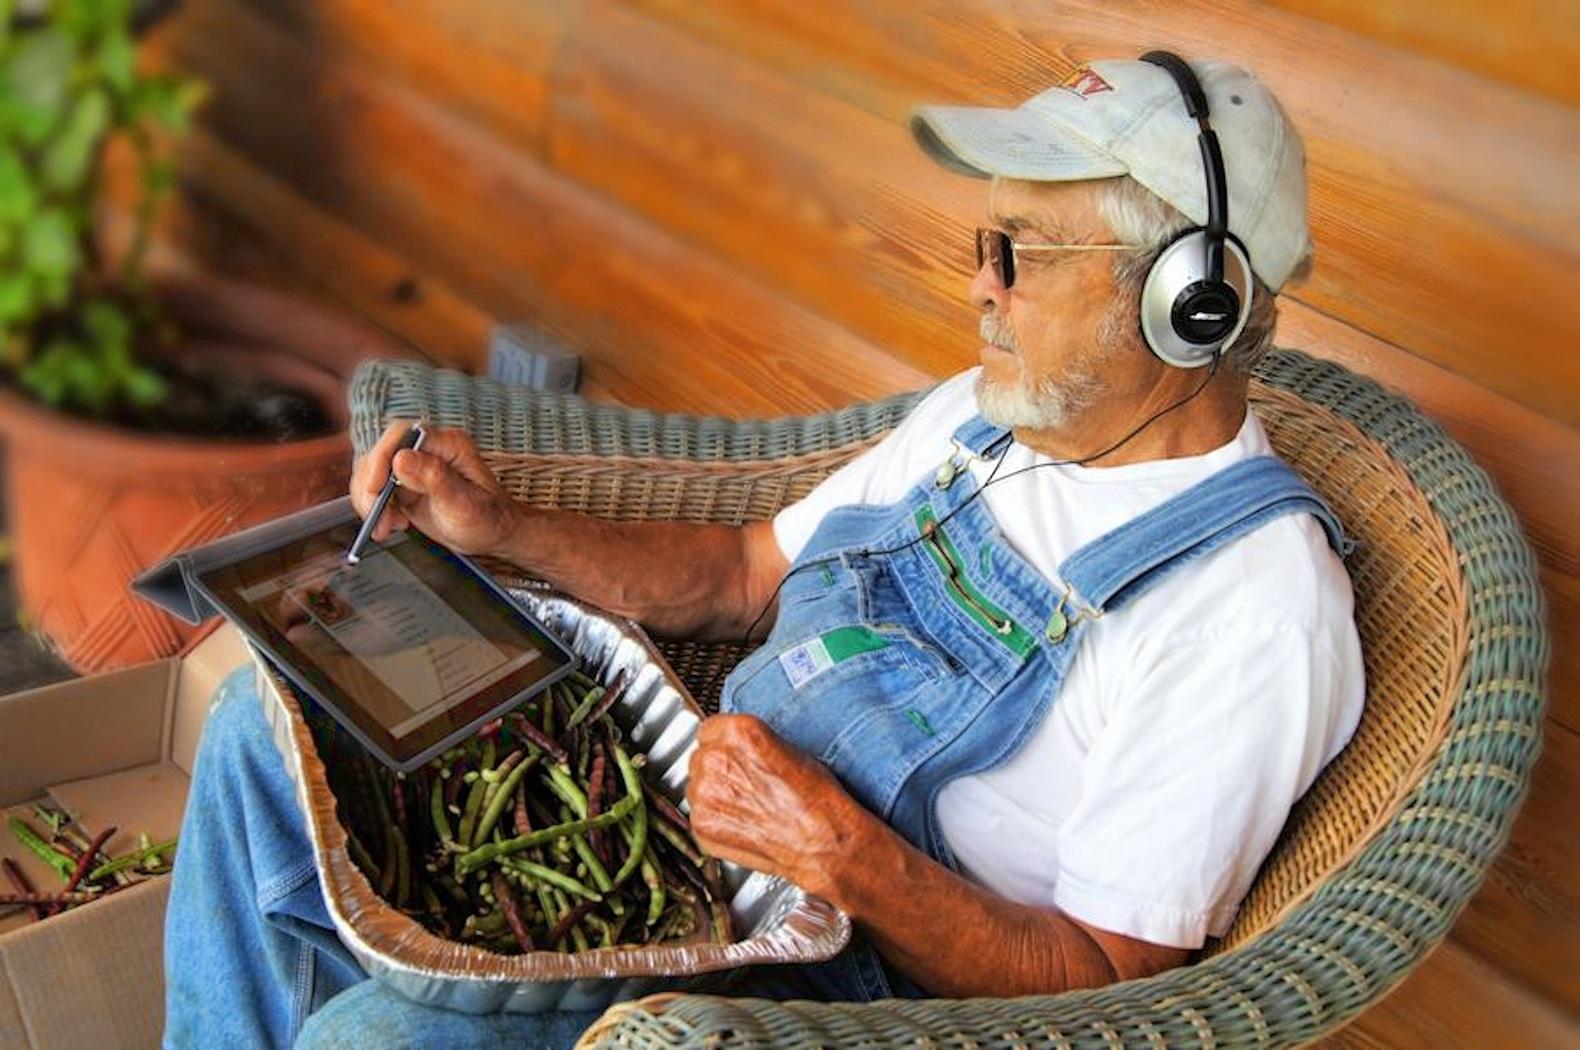 farmer using ipad to check results